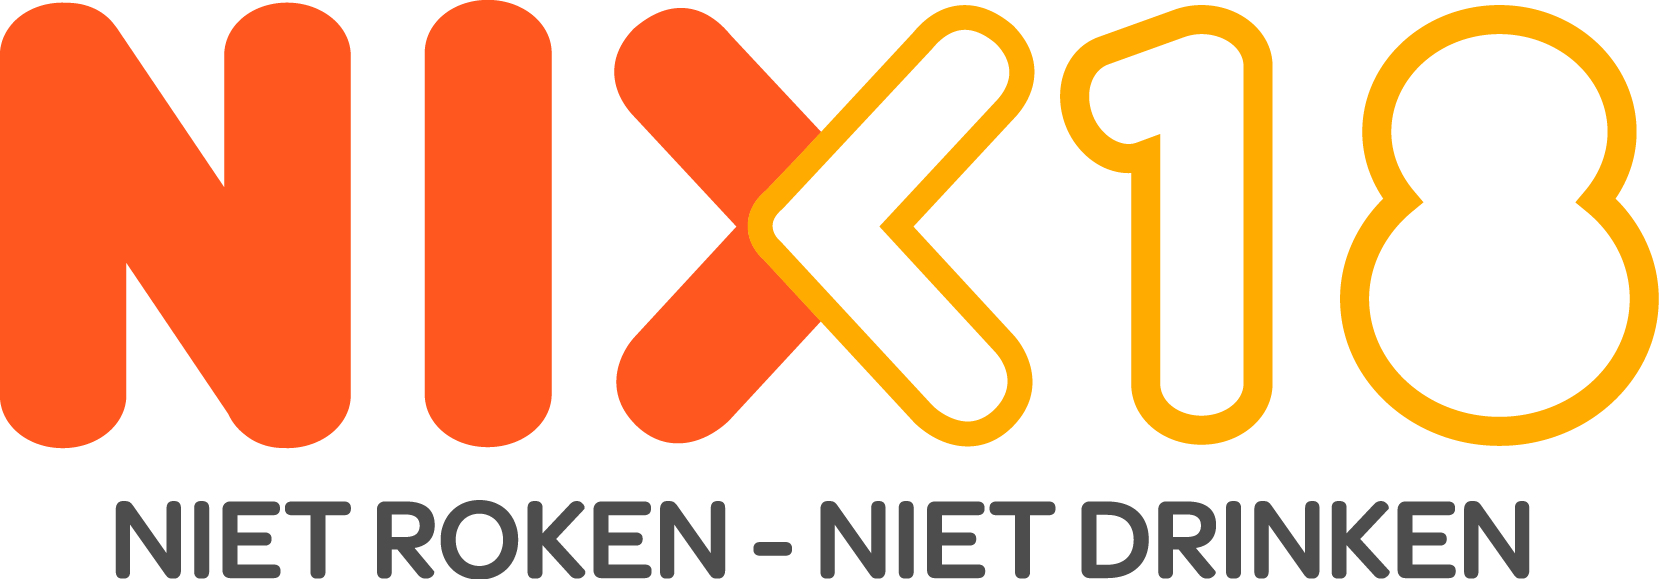 Tabak, sigaren, sigaretten en e-sigaretten nix 18 logo